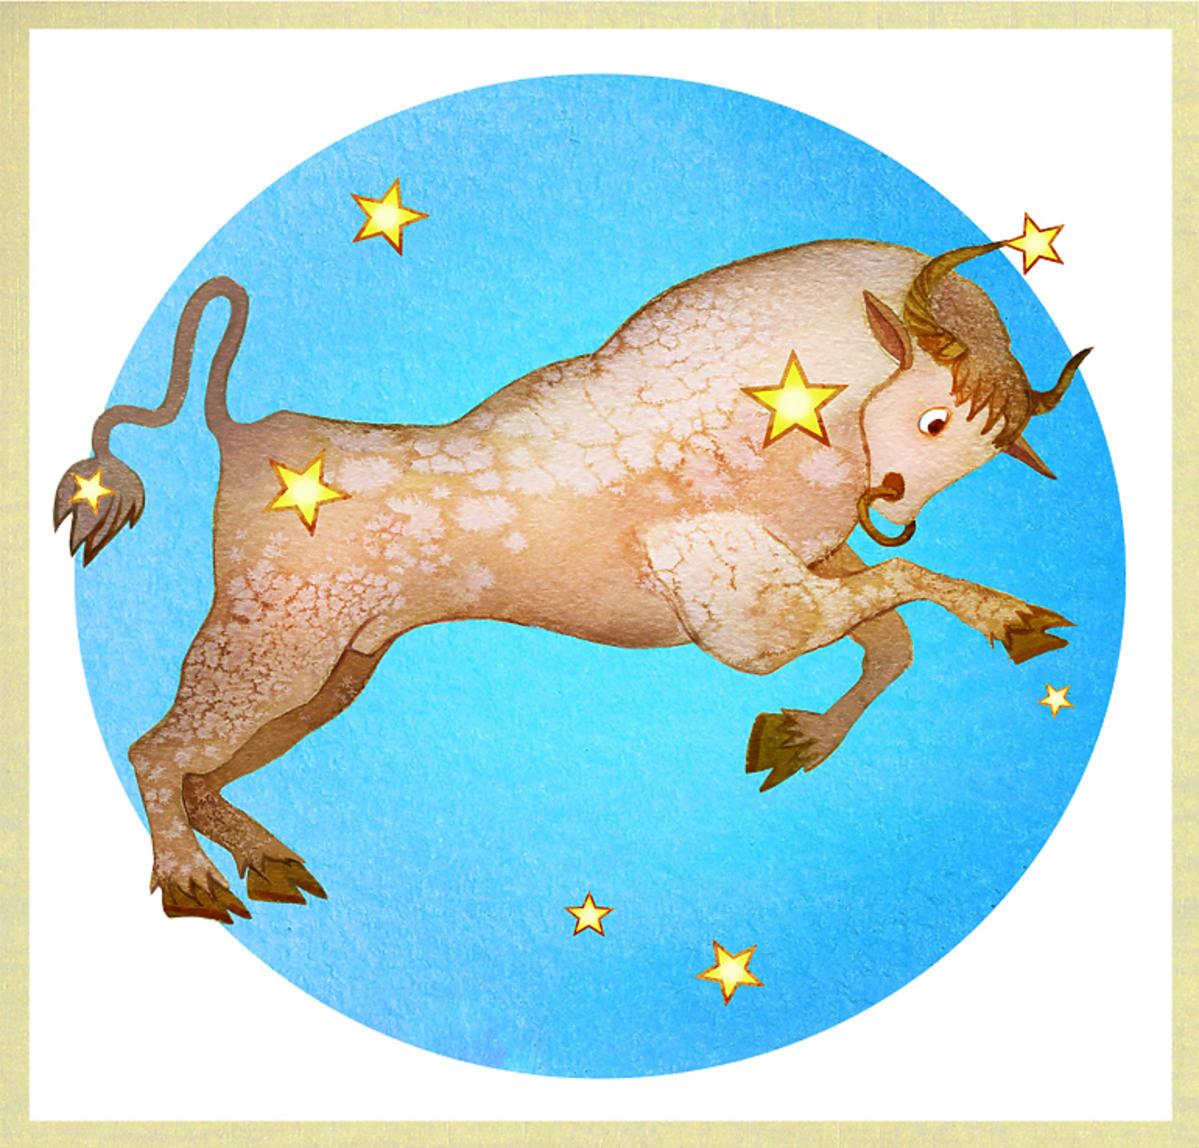 Byk horoskop zodiak